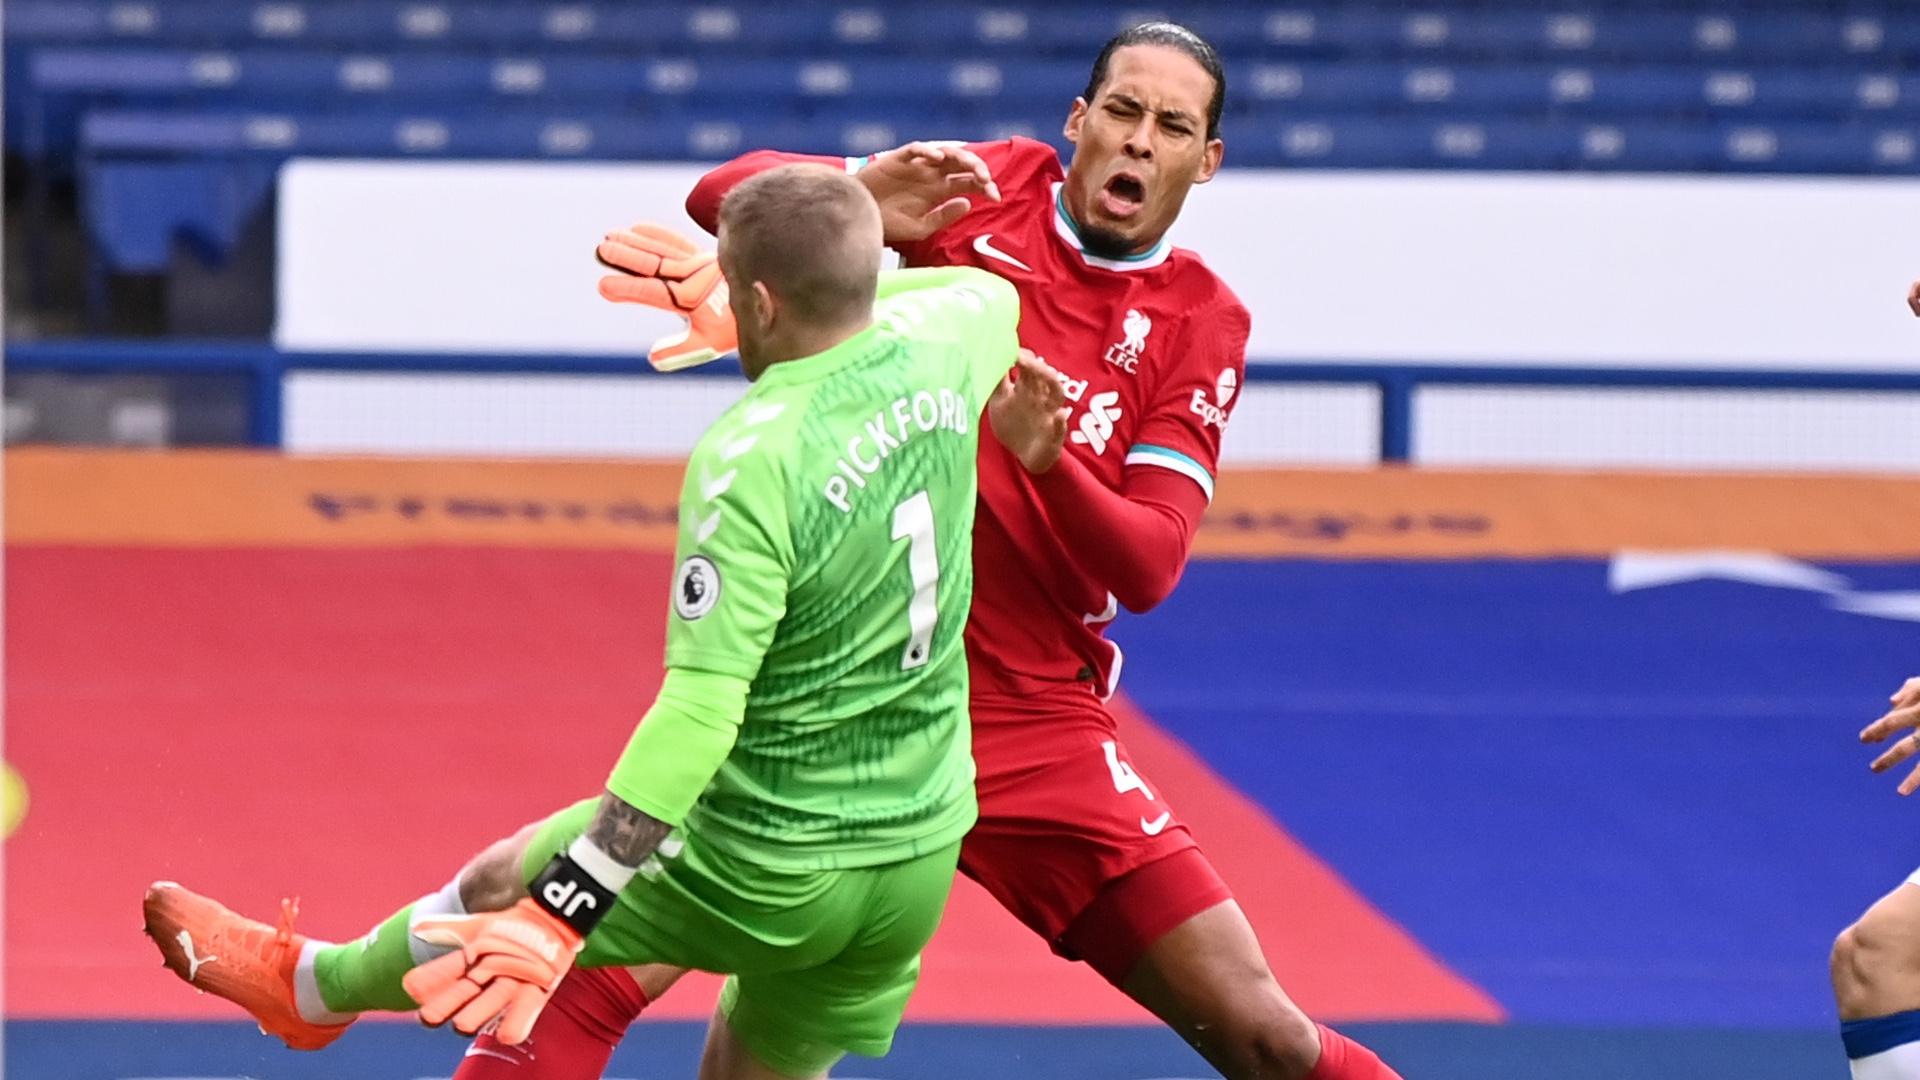 Klopp outlines plan for Van Dijk ahead of Liverpool season opener against Norwich